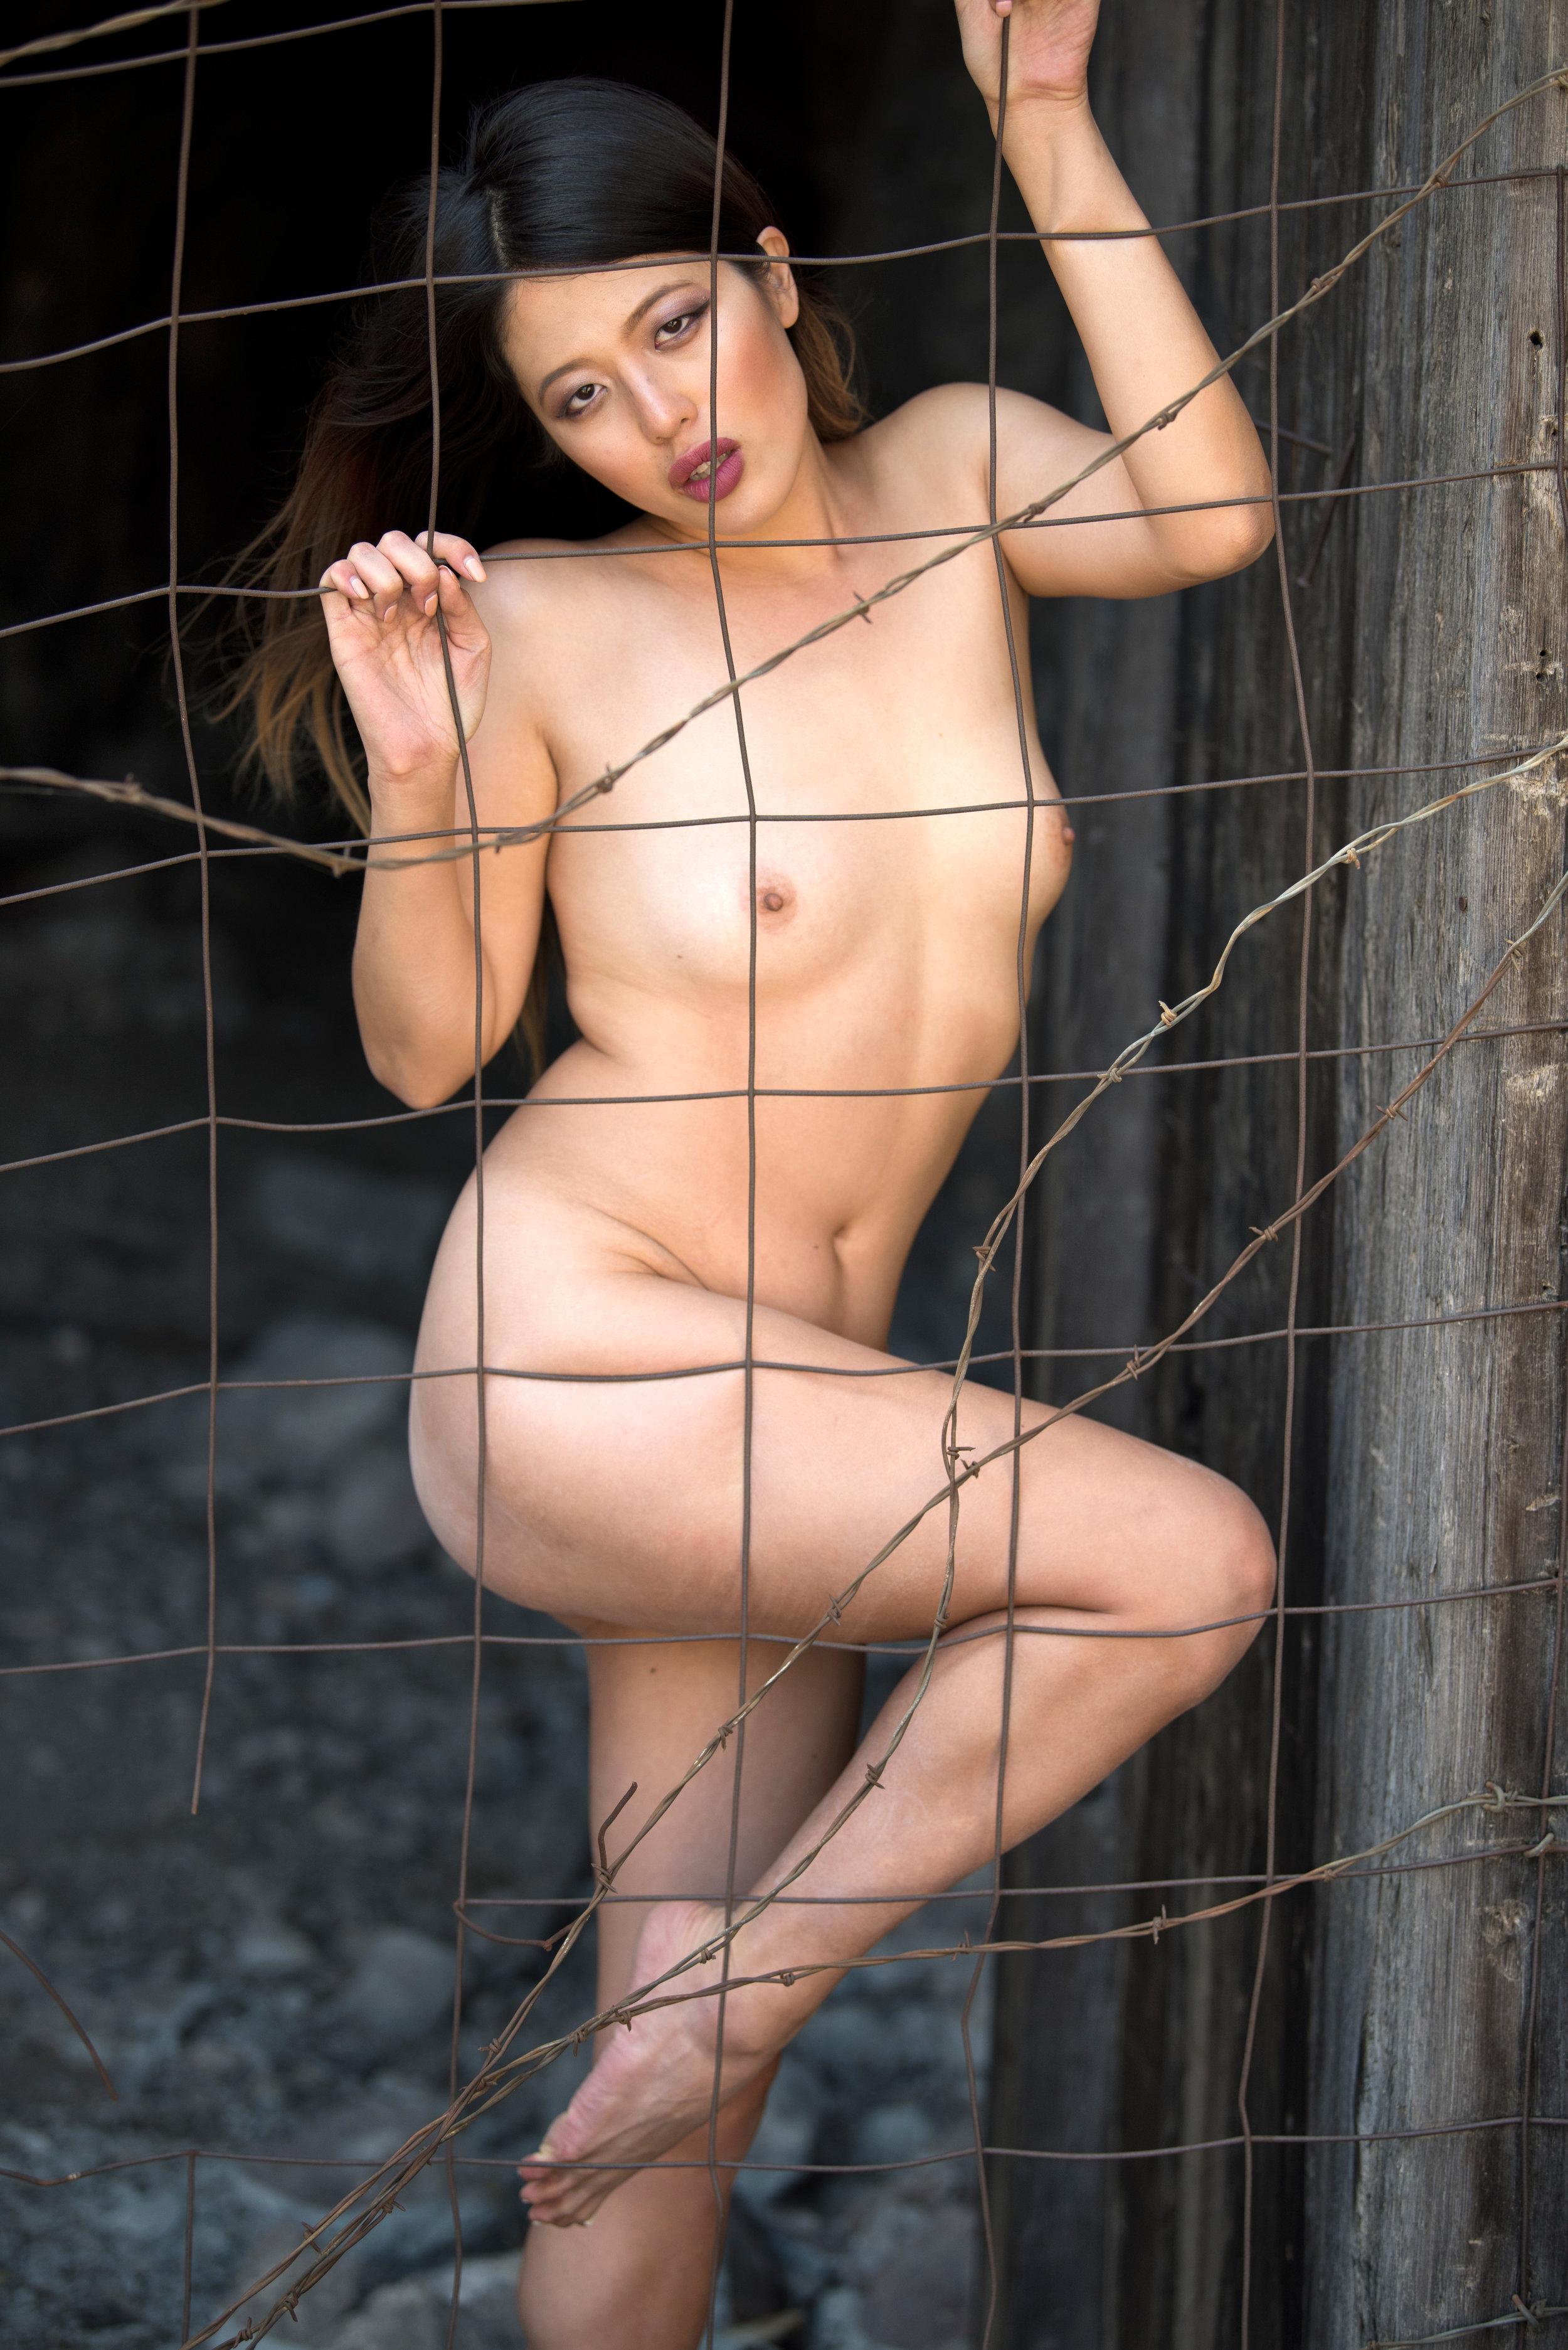 yenu-uncensored.jpg